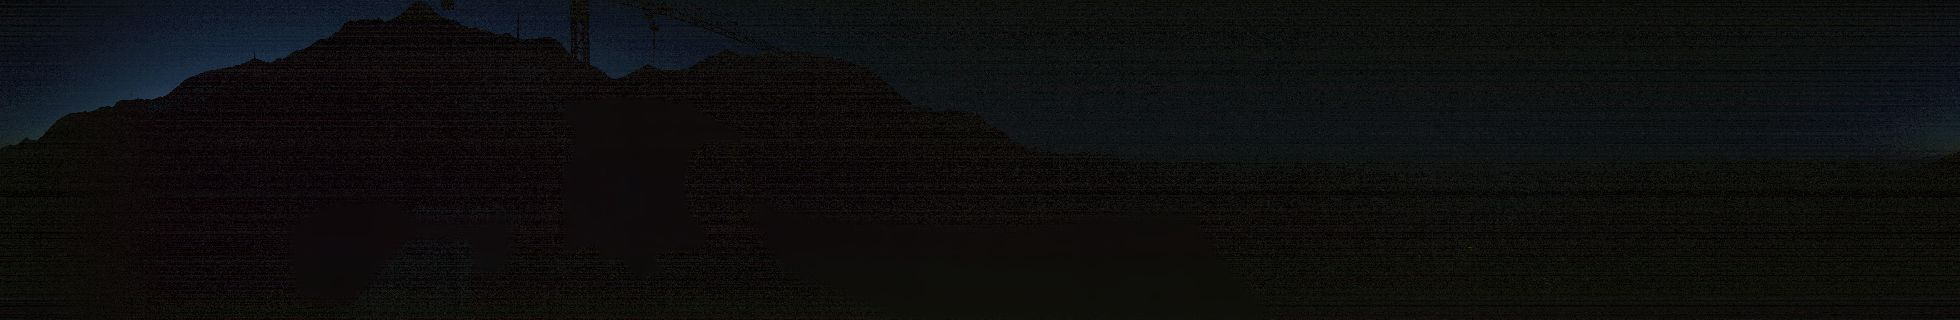 Pejo3000 Panorama